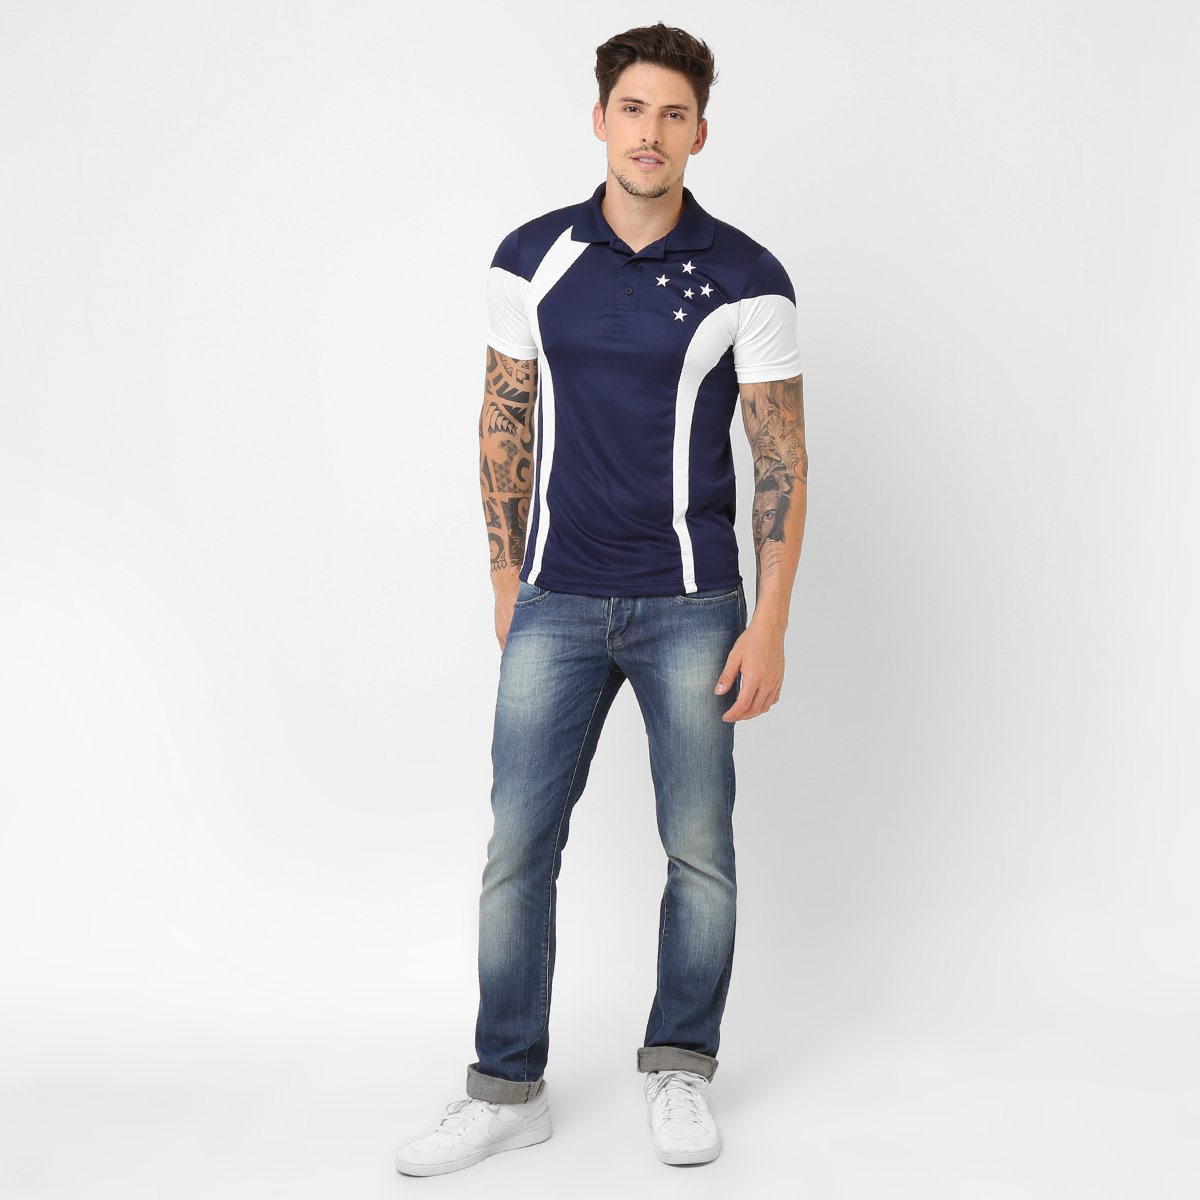 e49c5452c3 Camisa Polo Cruzeiro Heels - Compre Agora